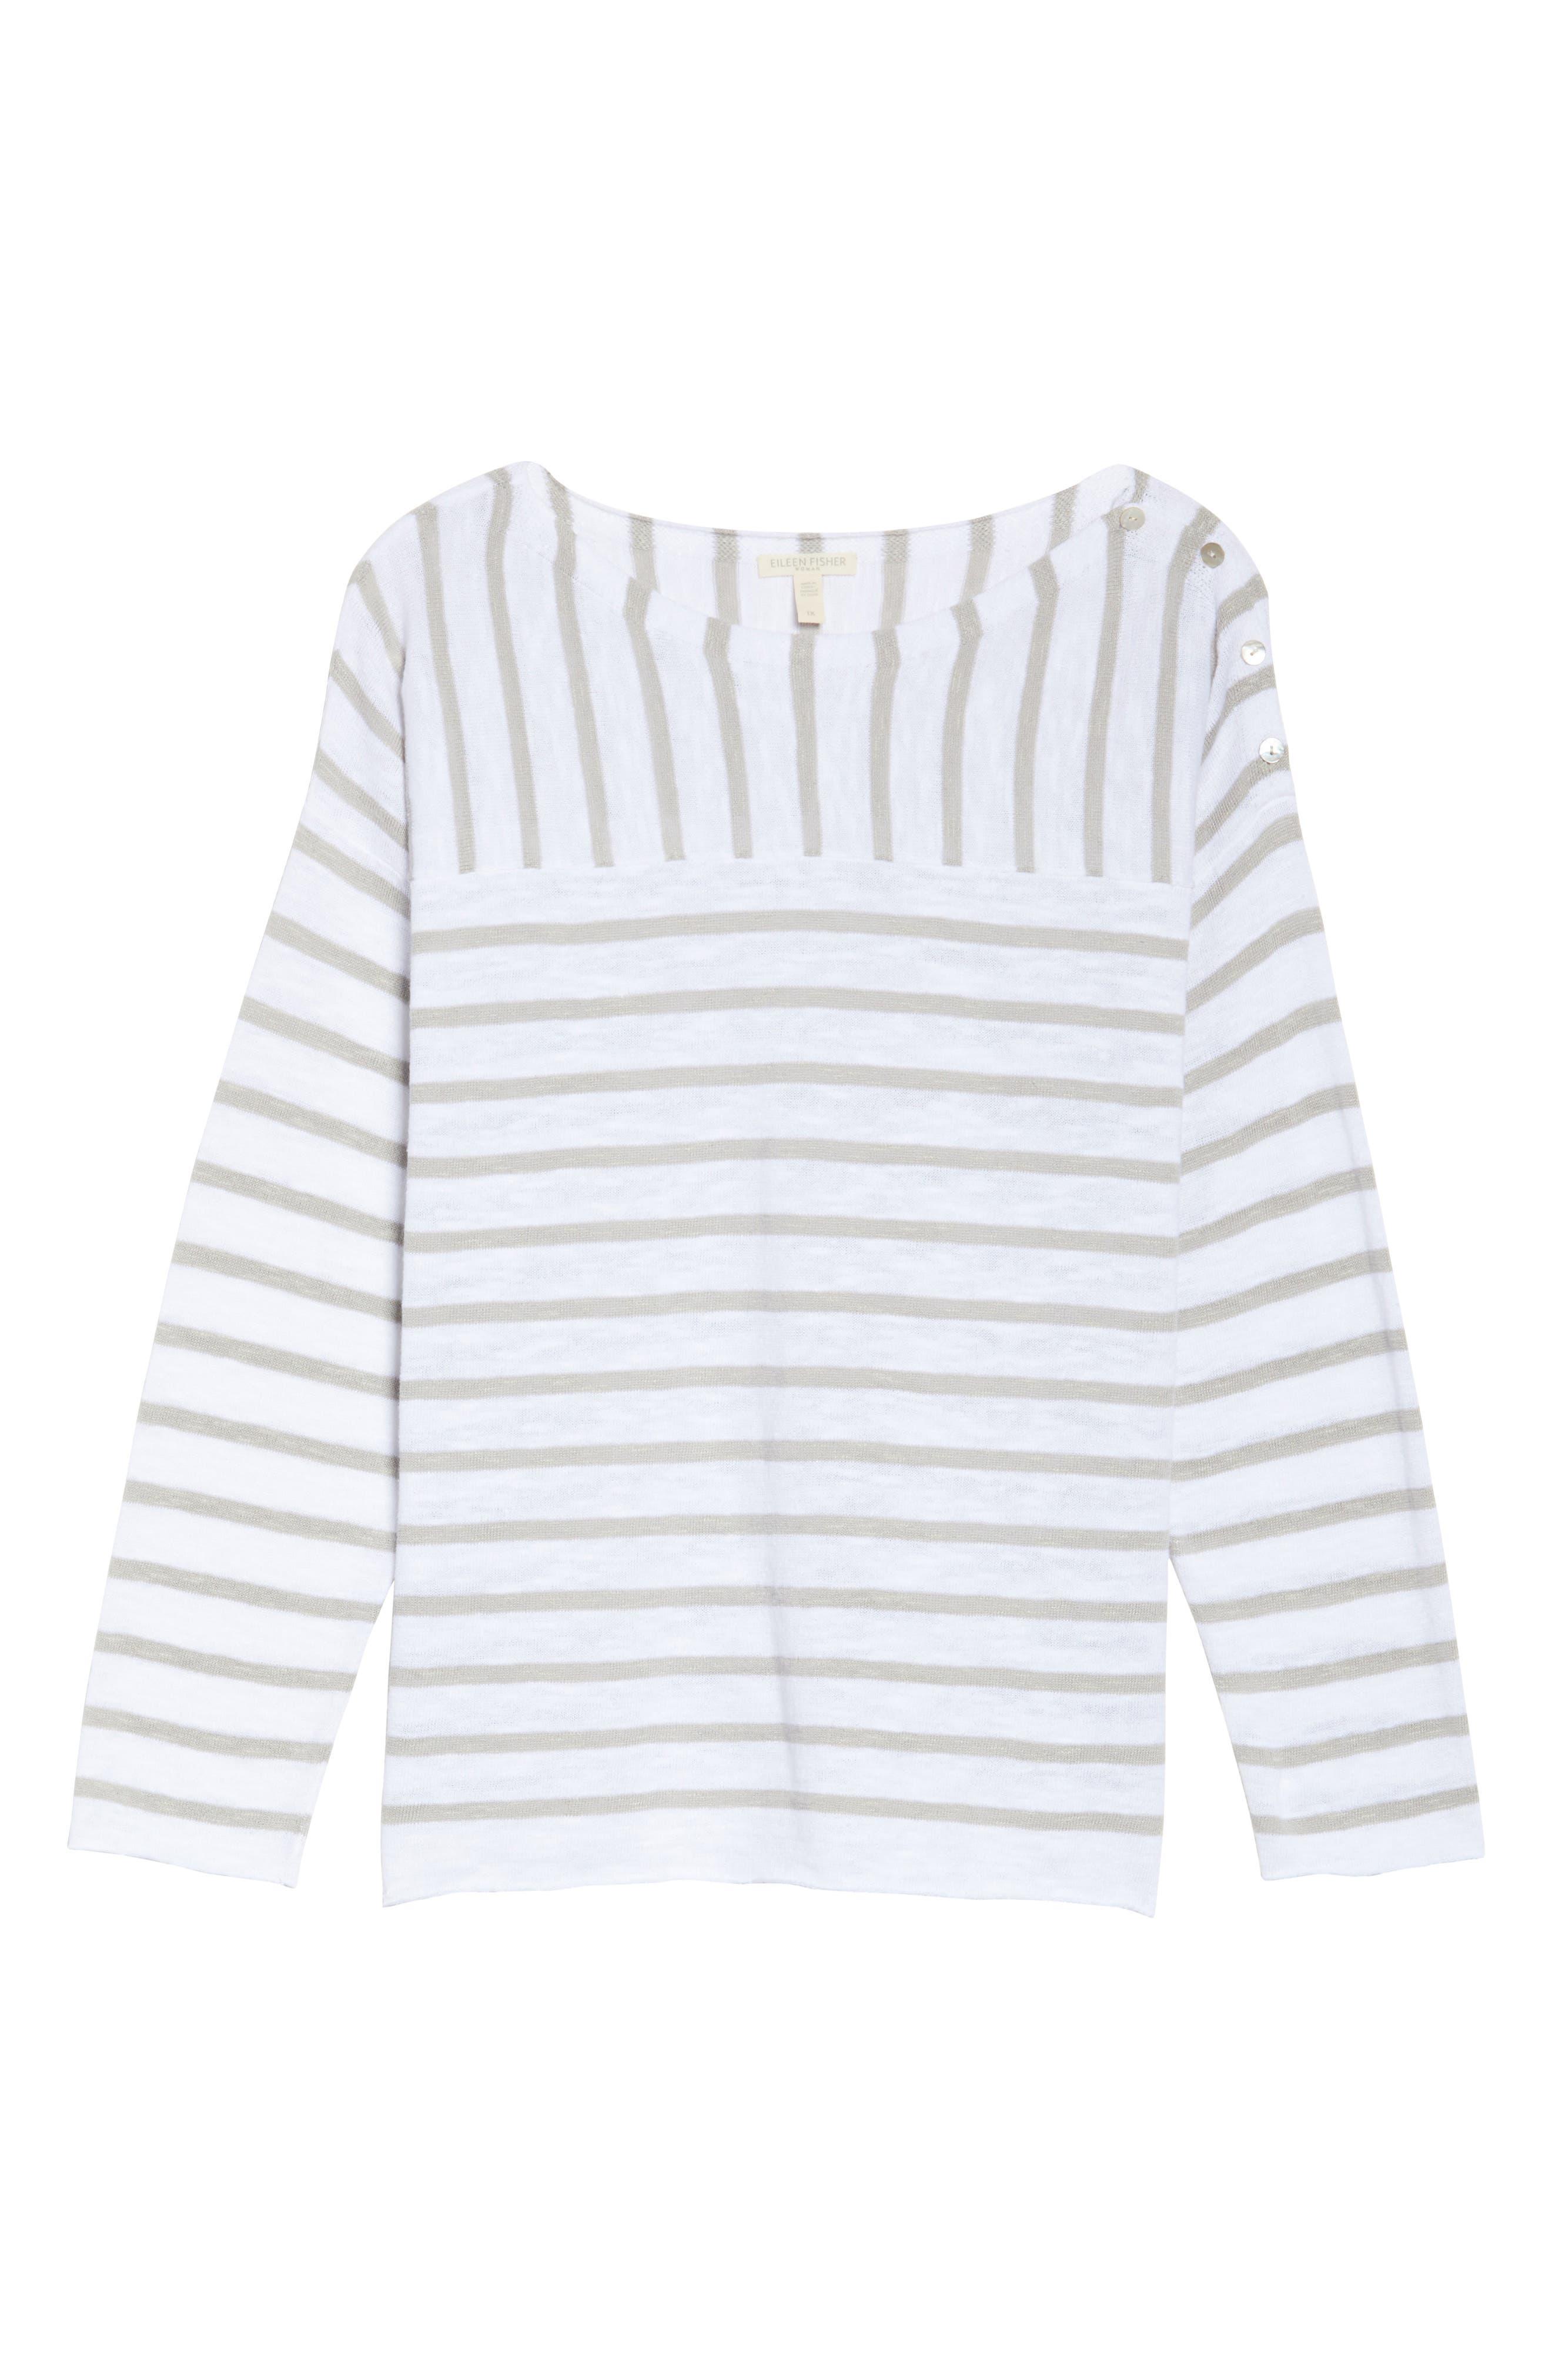 Stripe Organic Linen & Cotton Top,                             Alternate thumbnail 6, color,                             092